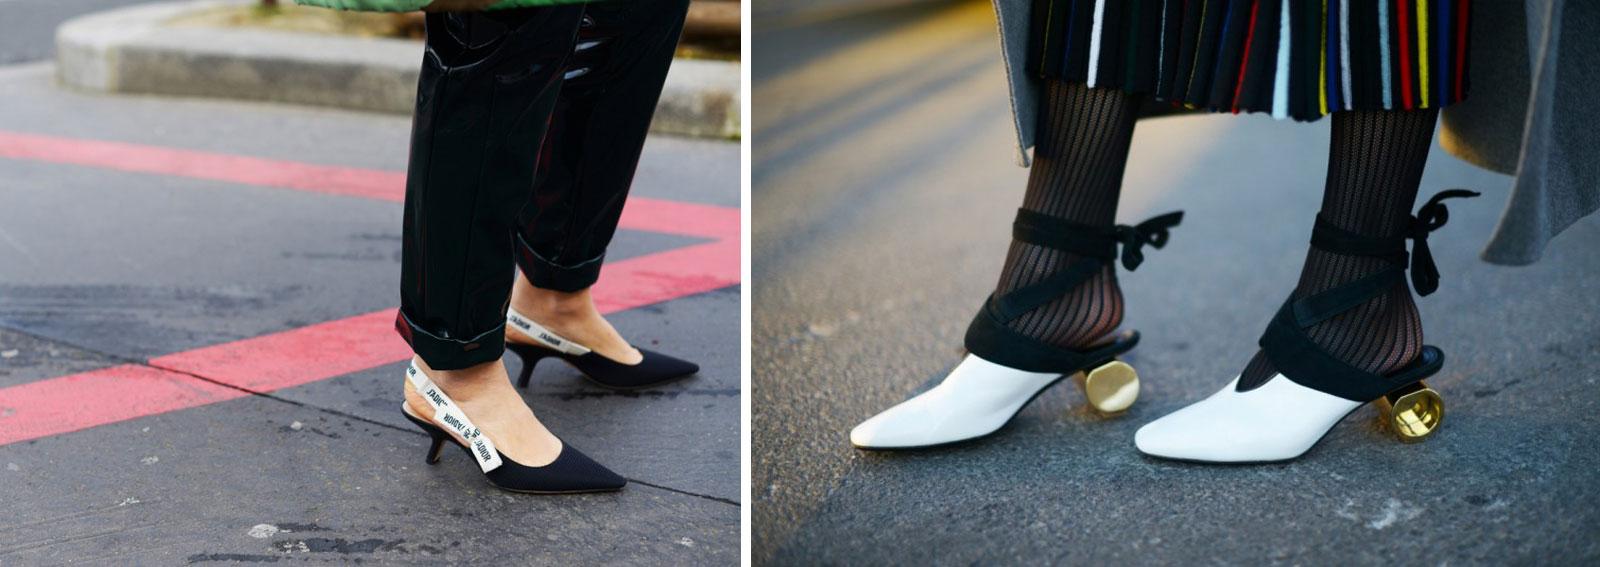 cover-scarpe-street-style-17-desktop